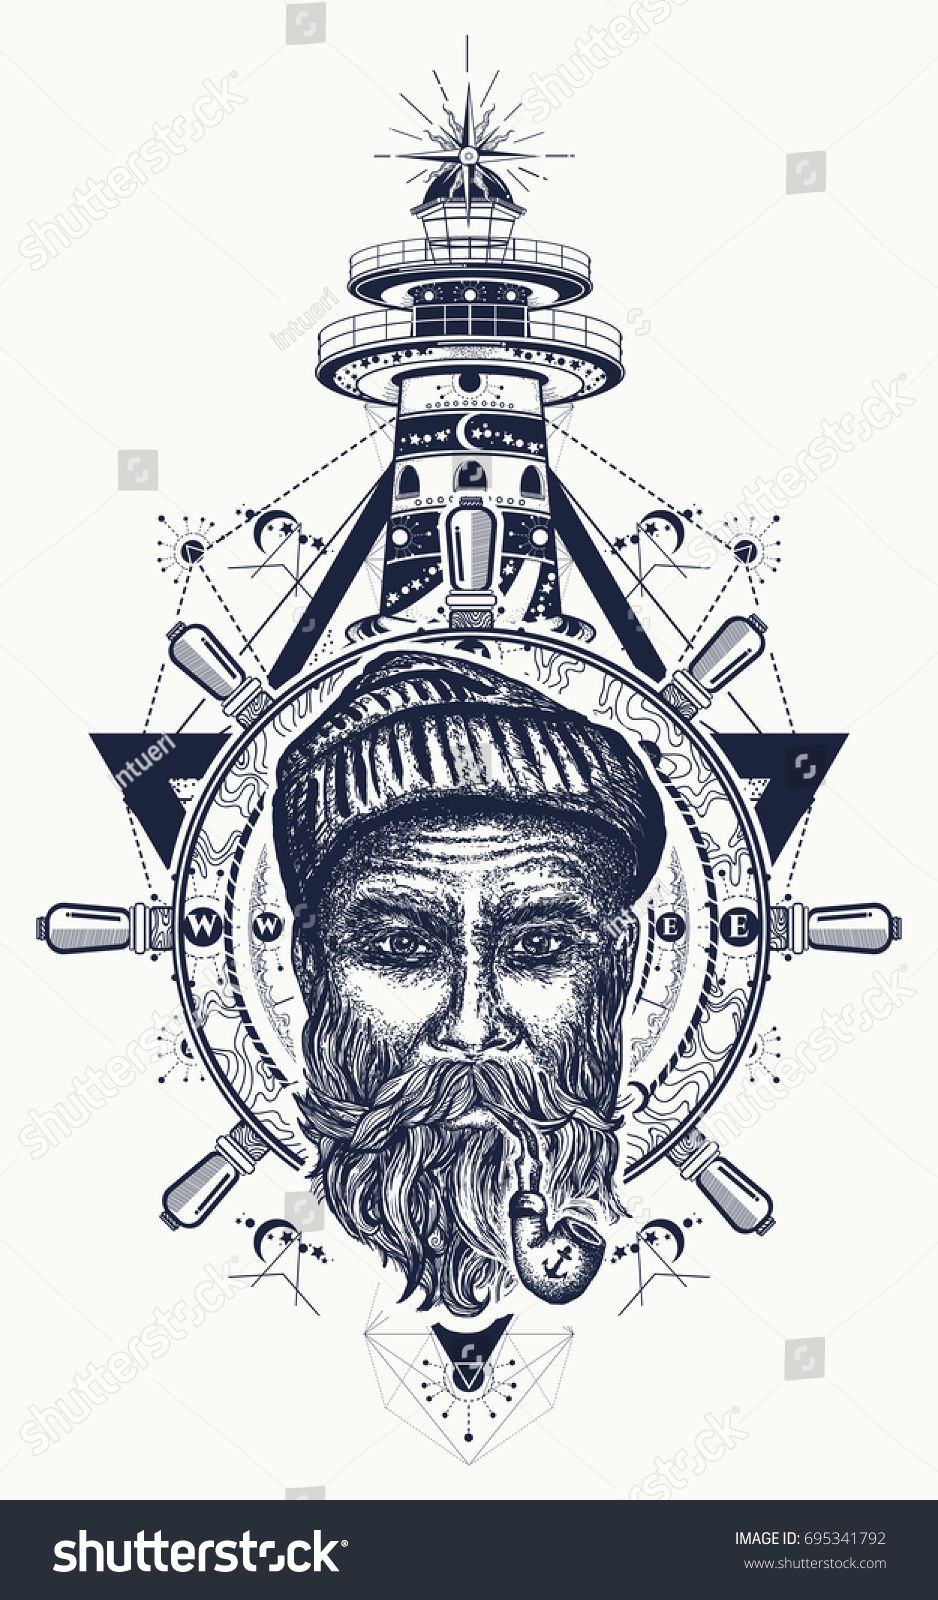 Old Sailor Anchor Steering Wheel Compass Lighthouse Tattoo Art